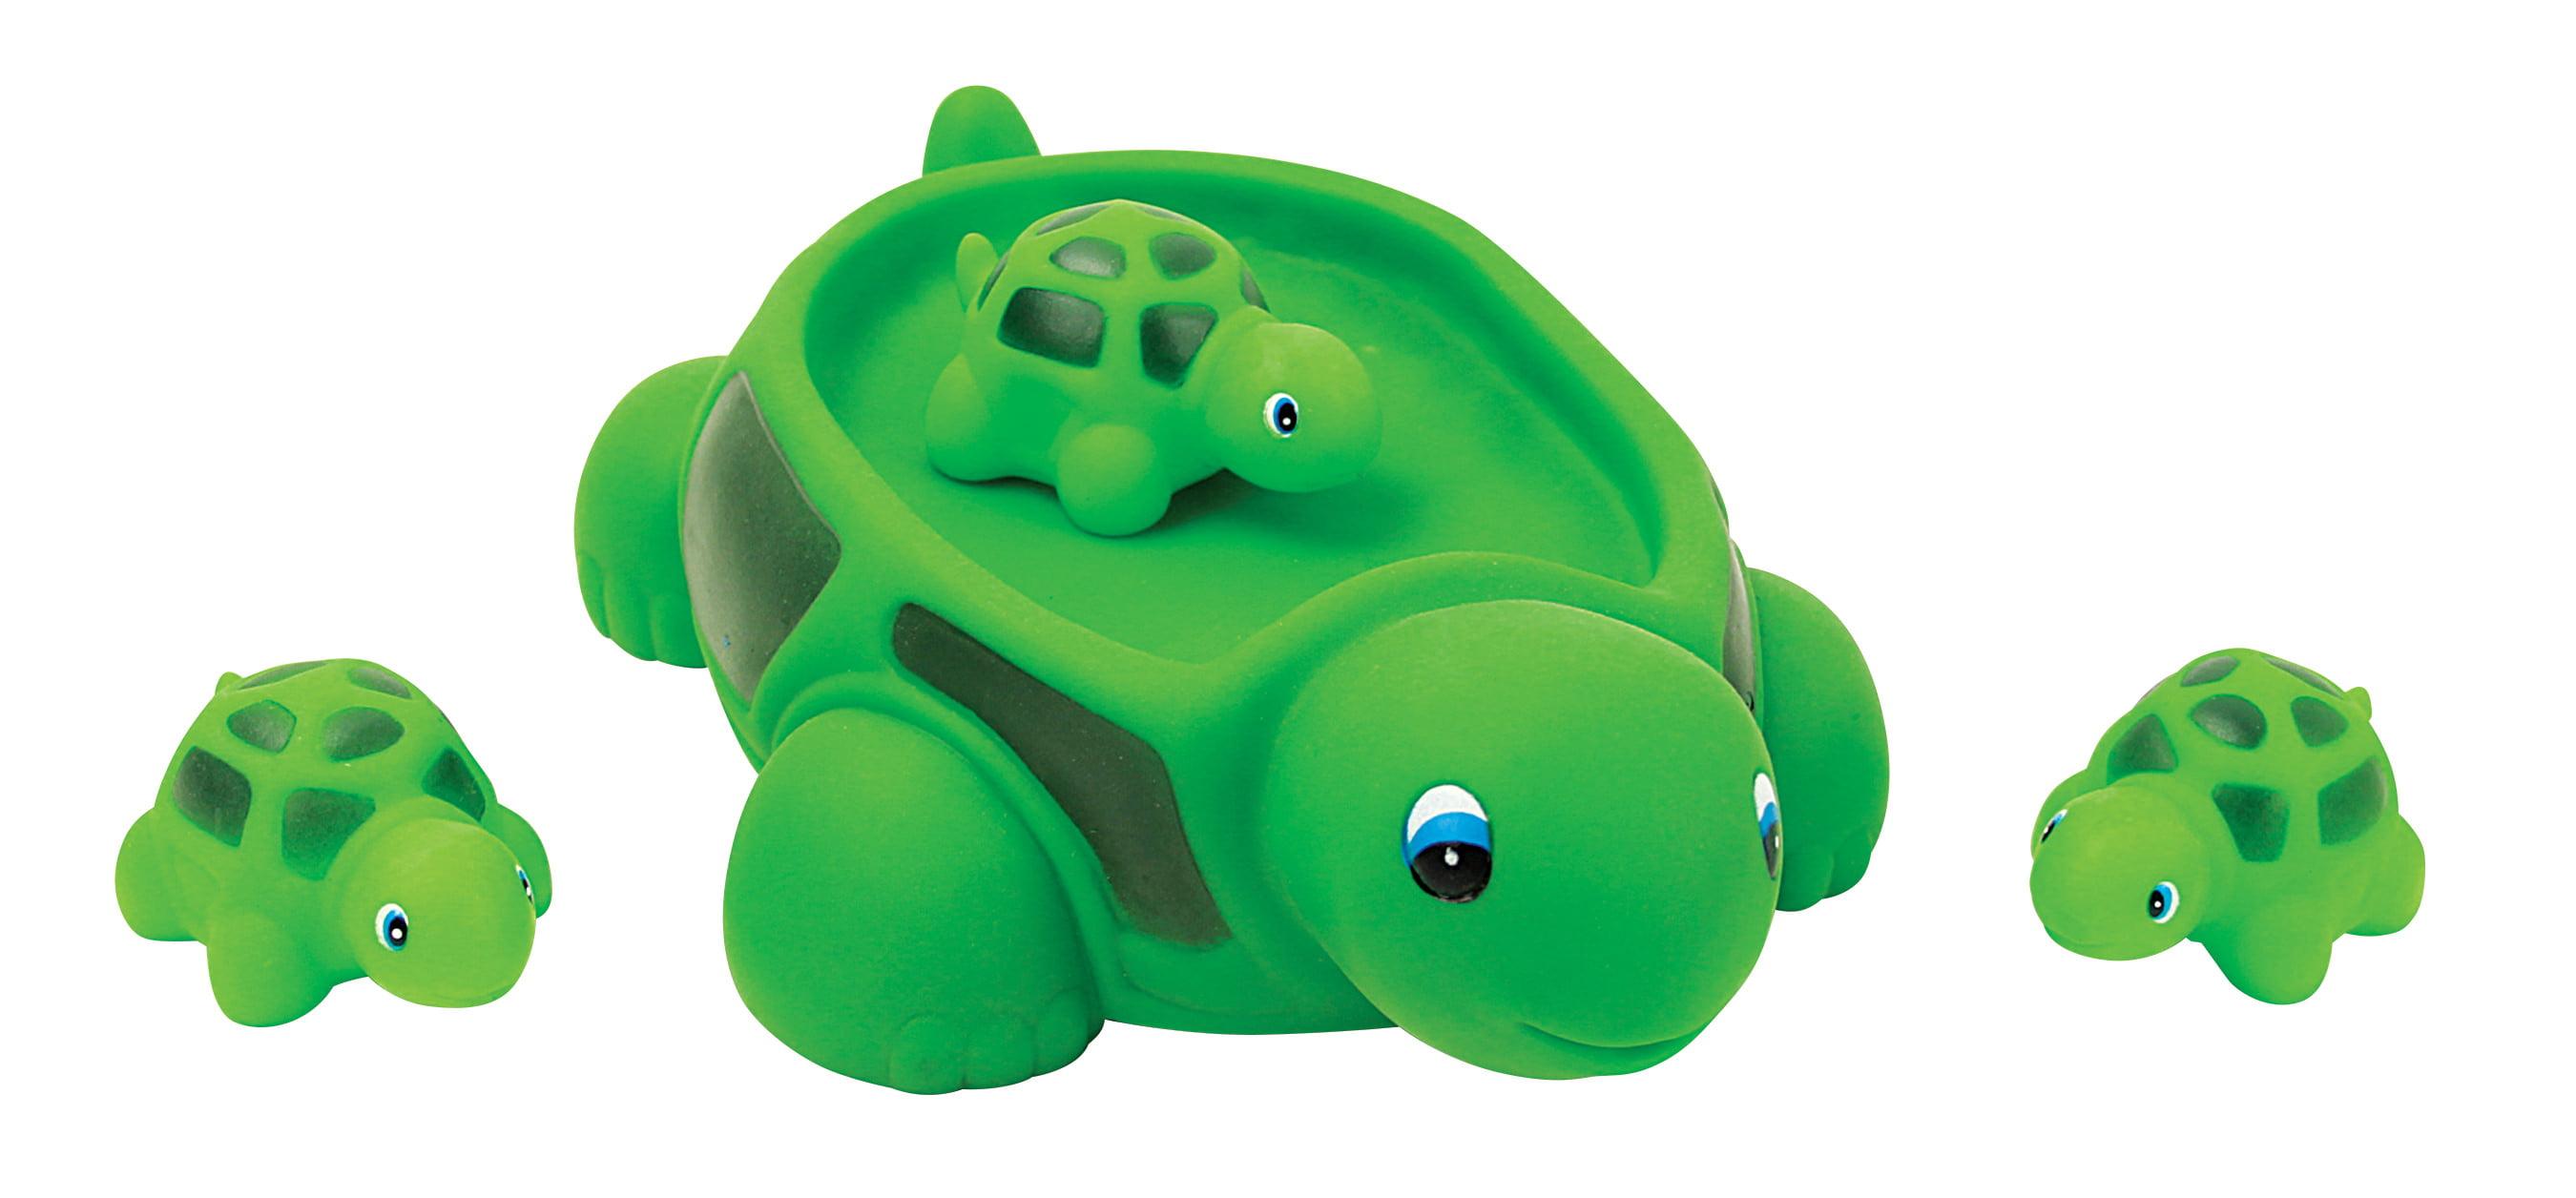 Tubby Scrubby Turtle Family Bath Toys by Tubby Scrubby